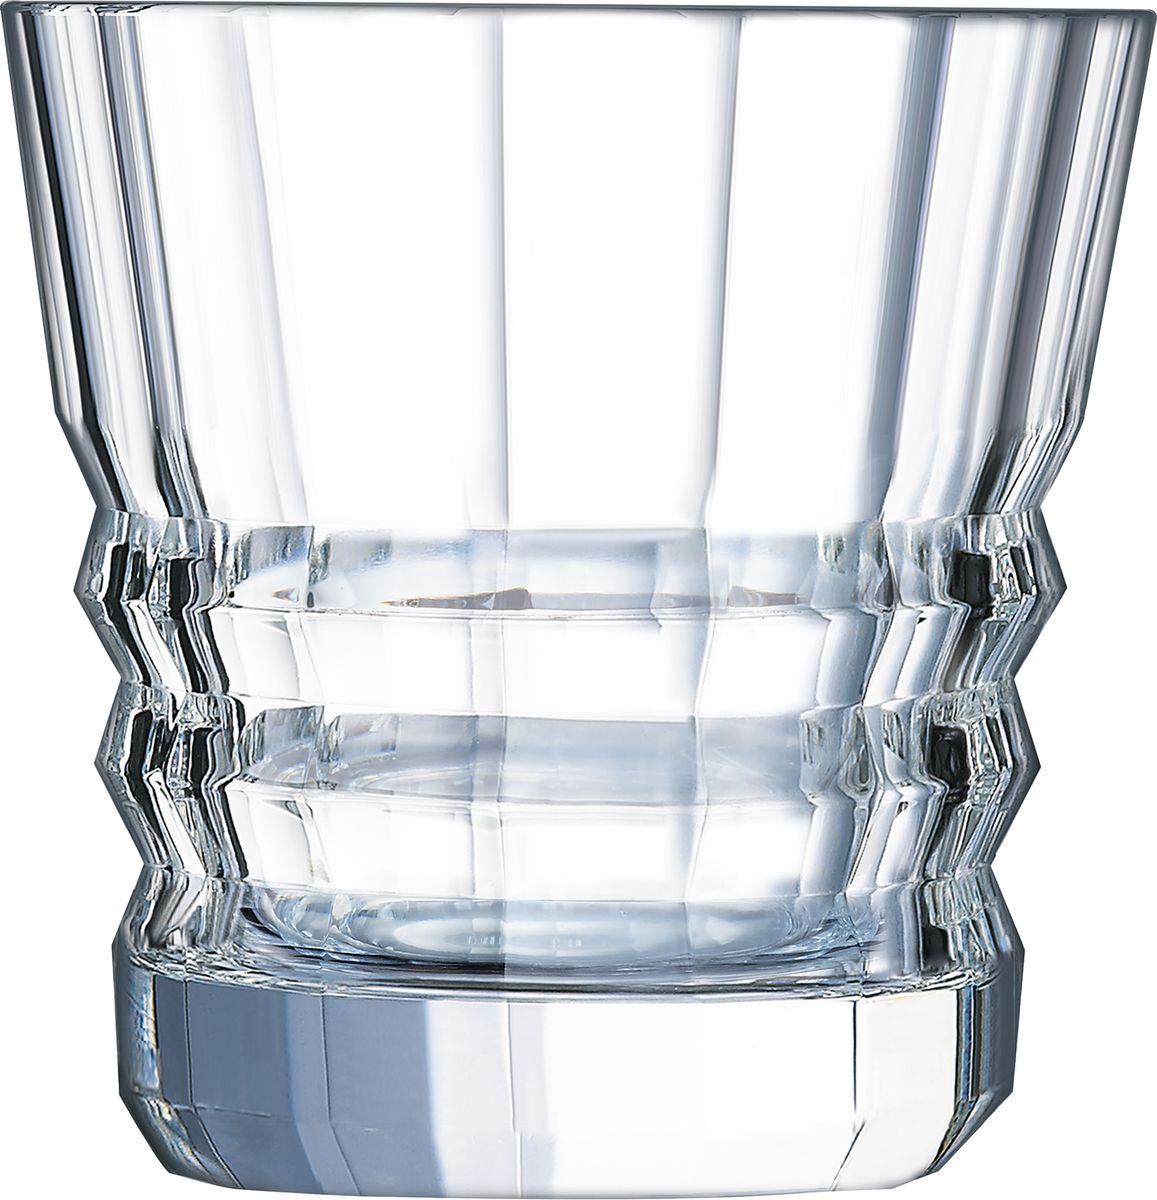 Набор стаканов Cristal d'Arques Architecte, 380 мл, 6 шт набор бокалов cristal d arques набор фужеров fleury epi cristal d arques 200мл 6 шт